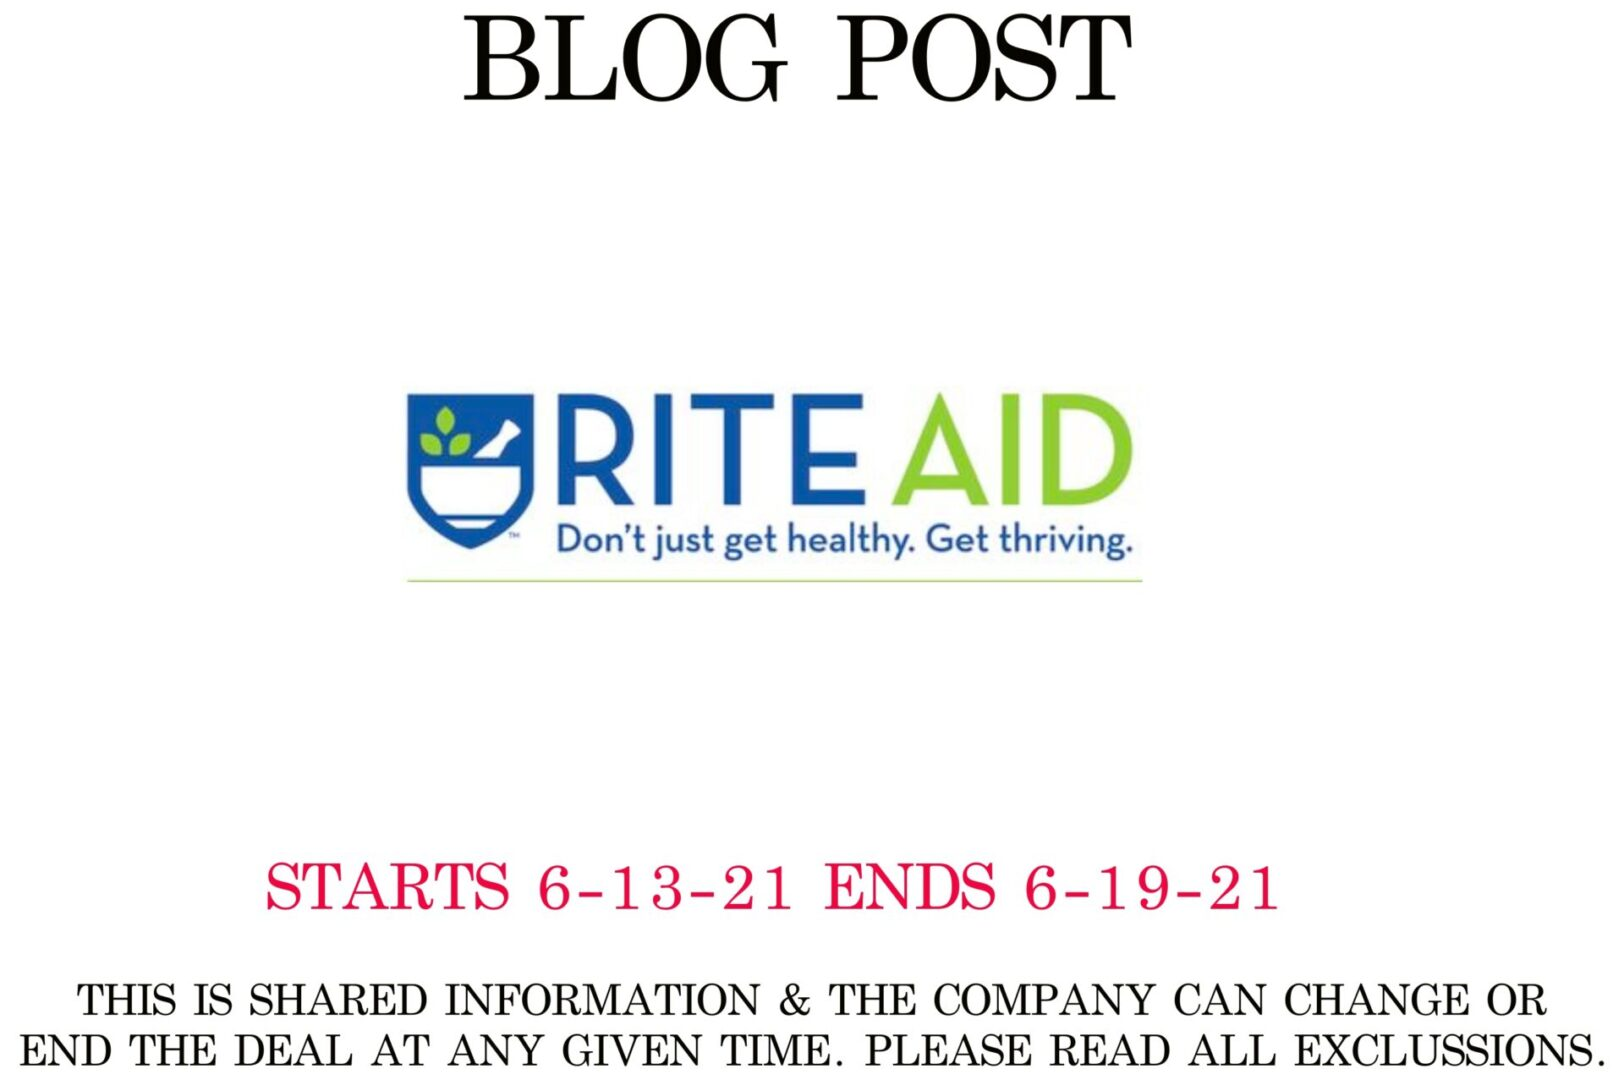 RITEAID-1